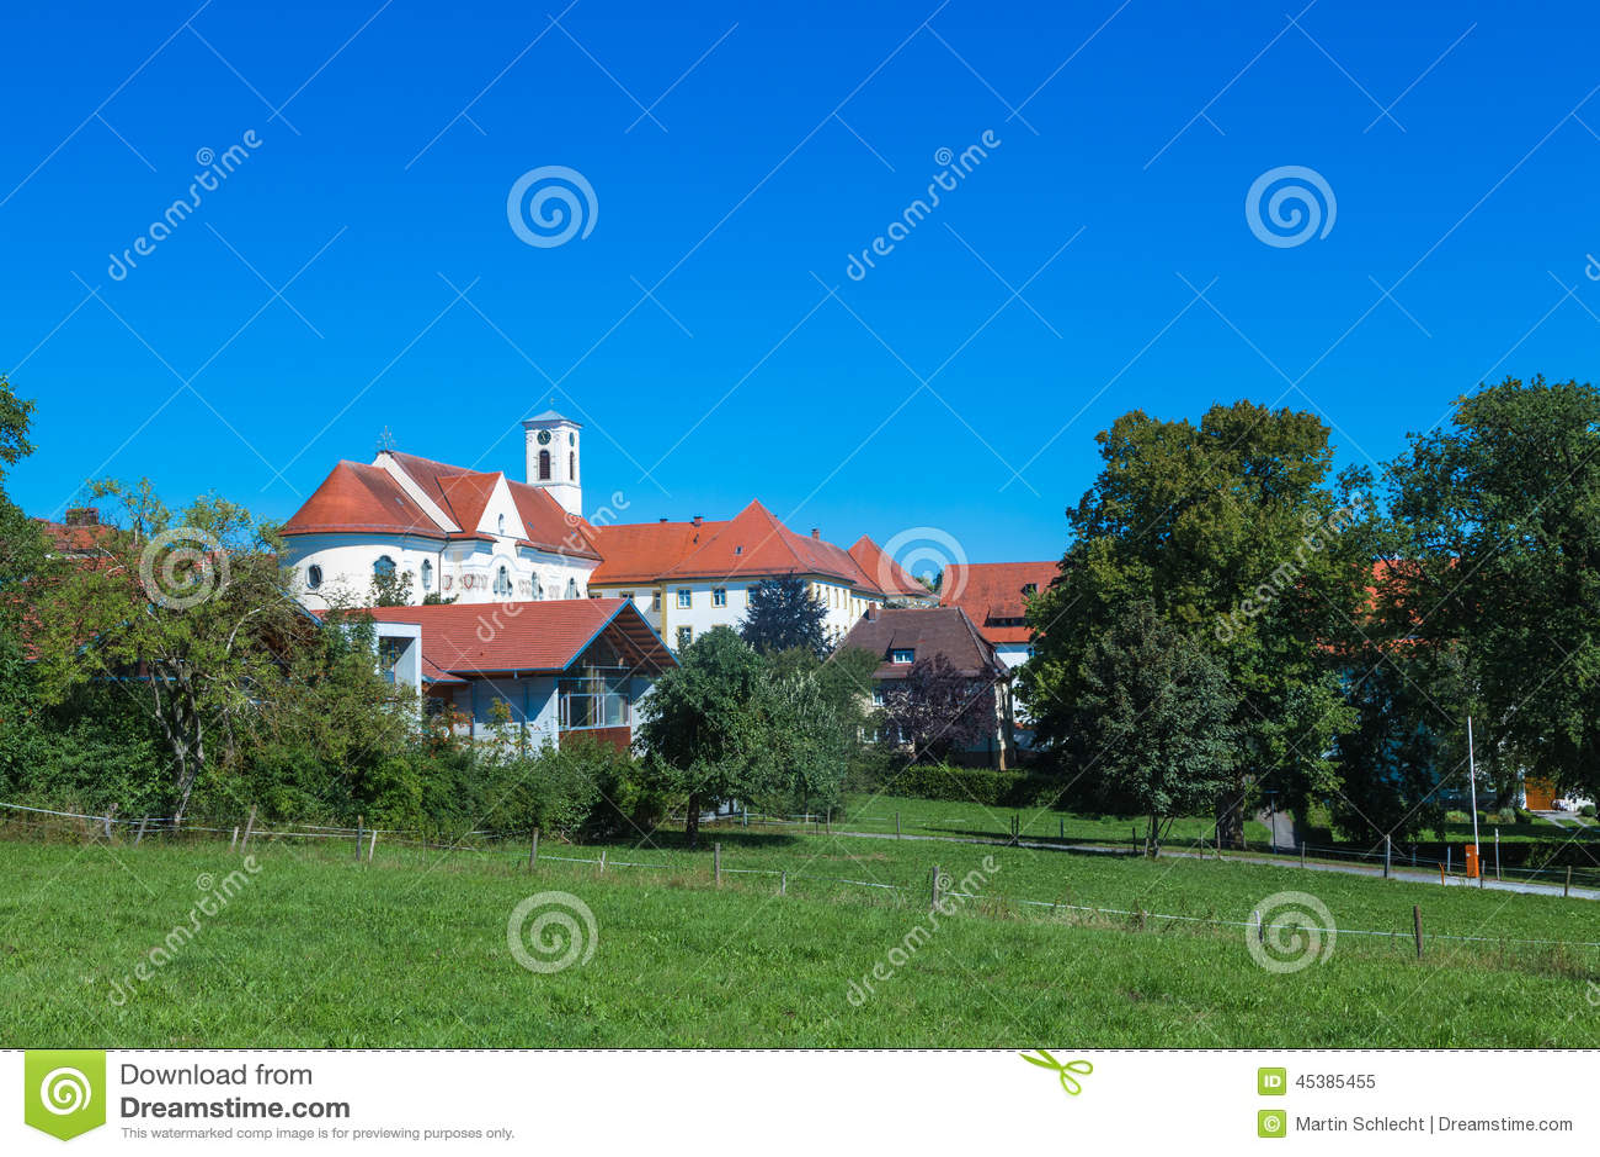 monastery siessen stock photo image 45385455. Black Bedroom Furniture Sets. Home Design Ideas